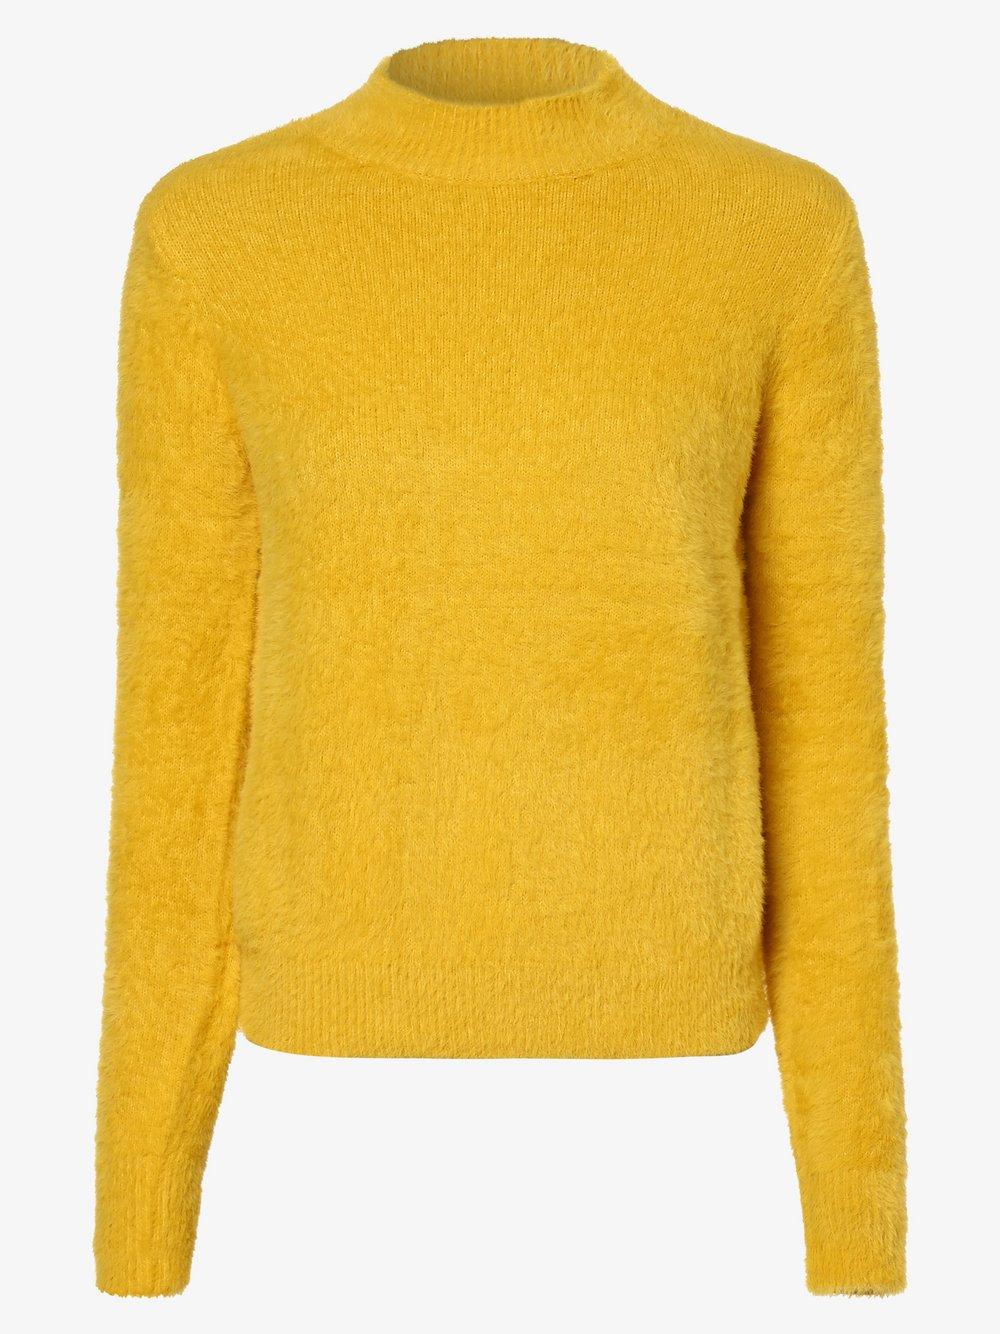 Guess Jeans - Sweter damski, żółty